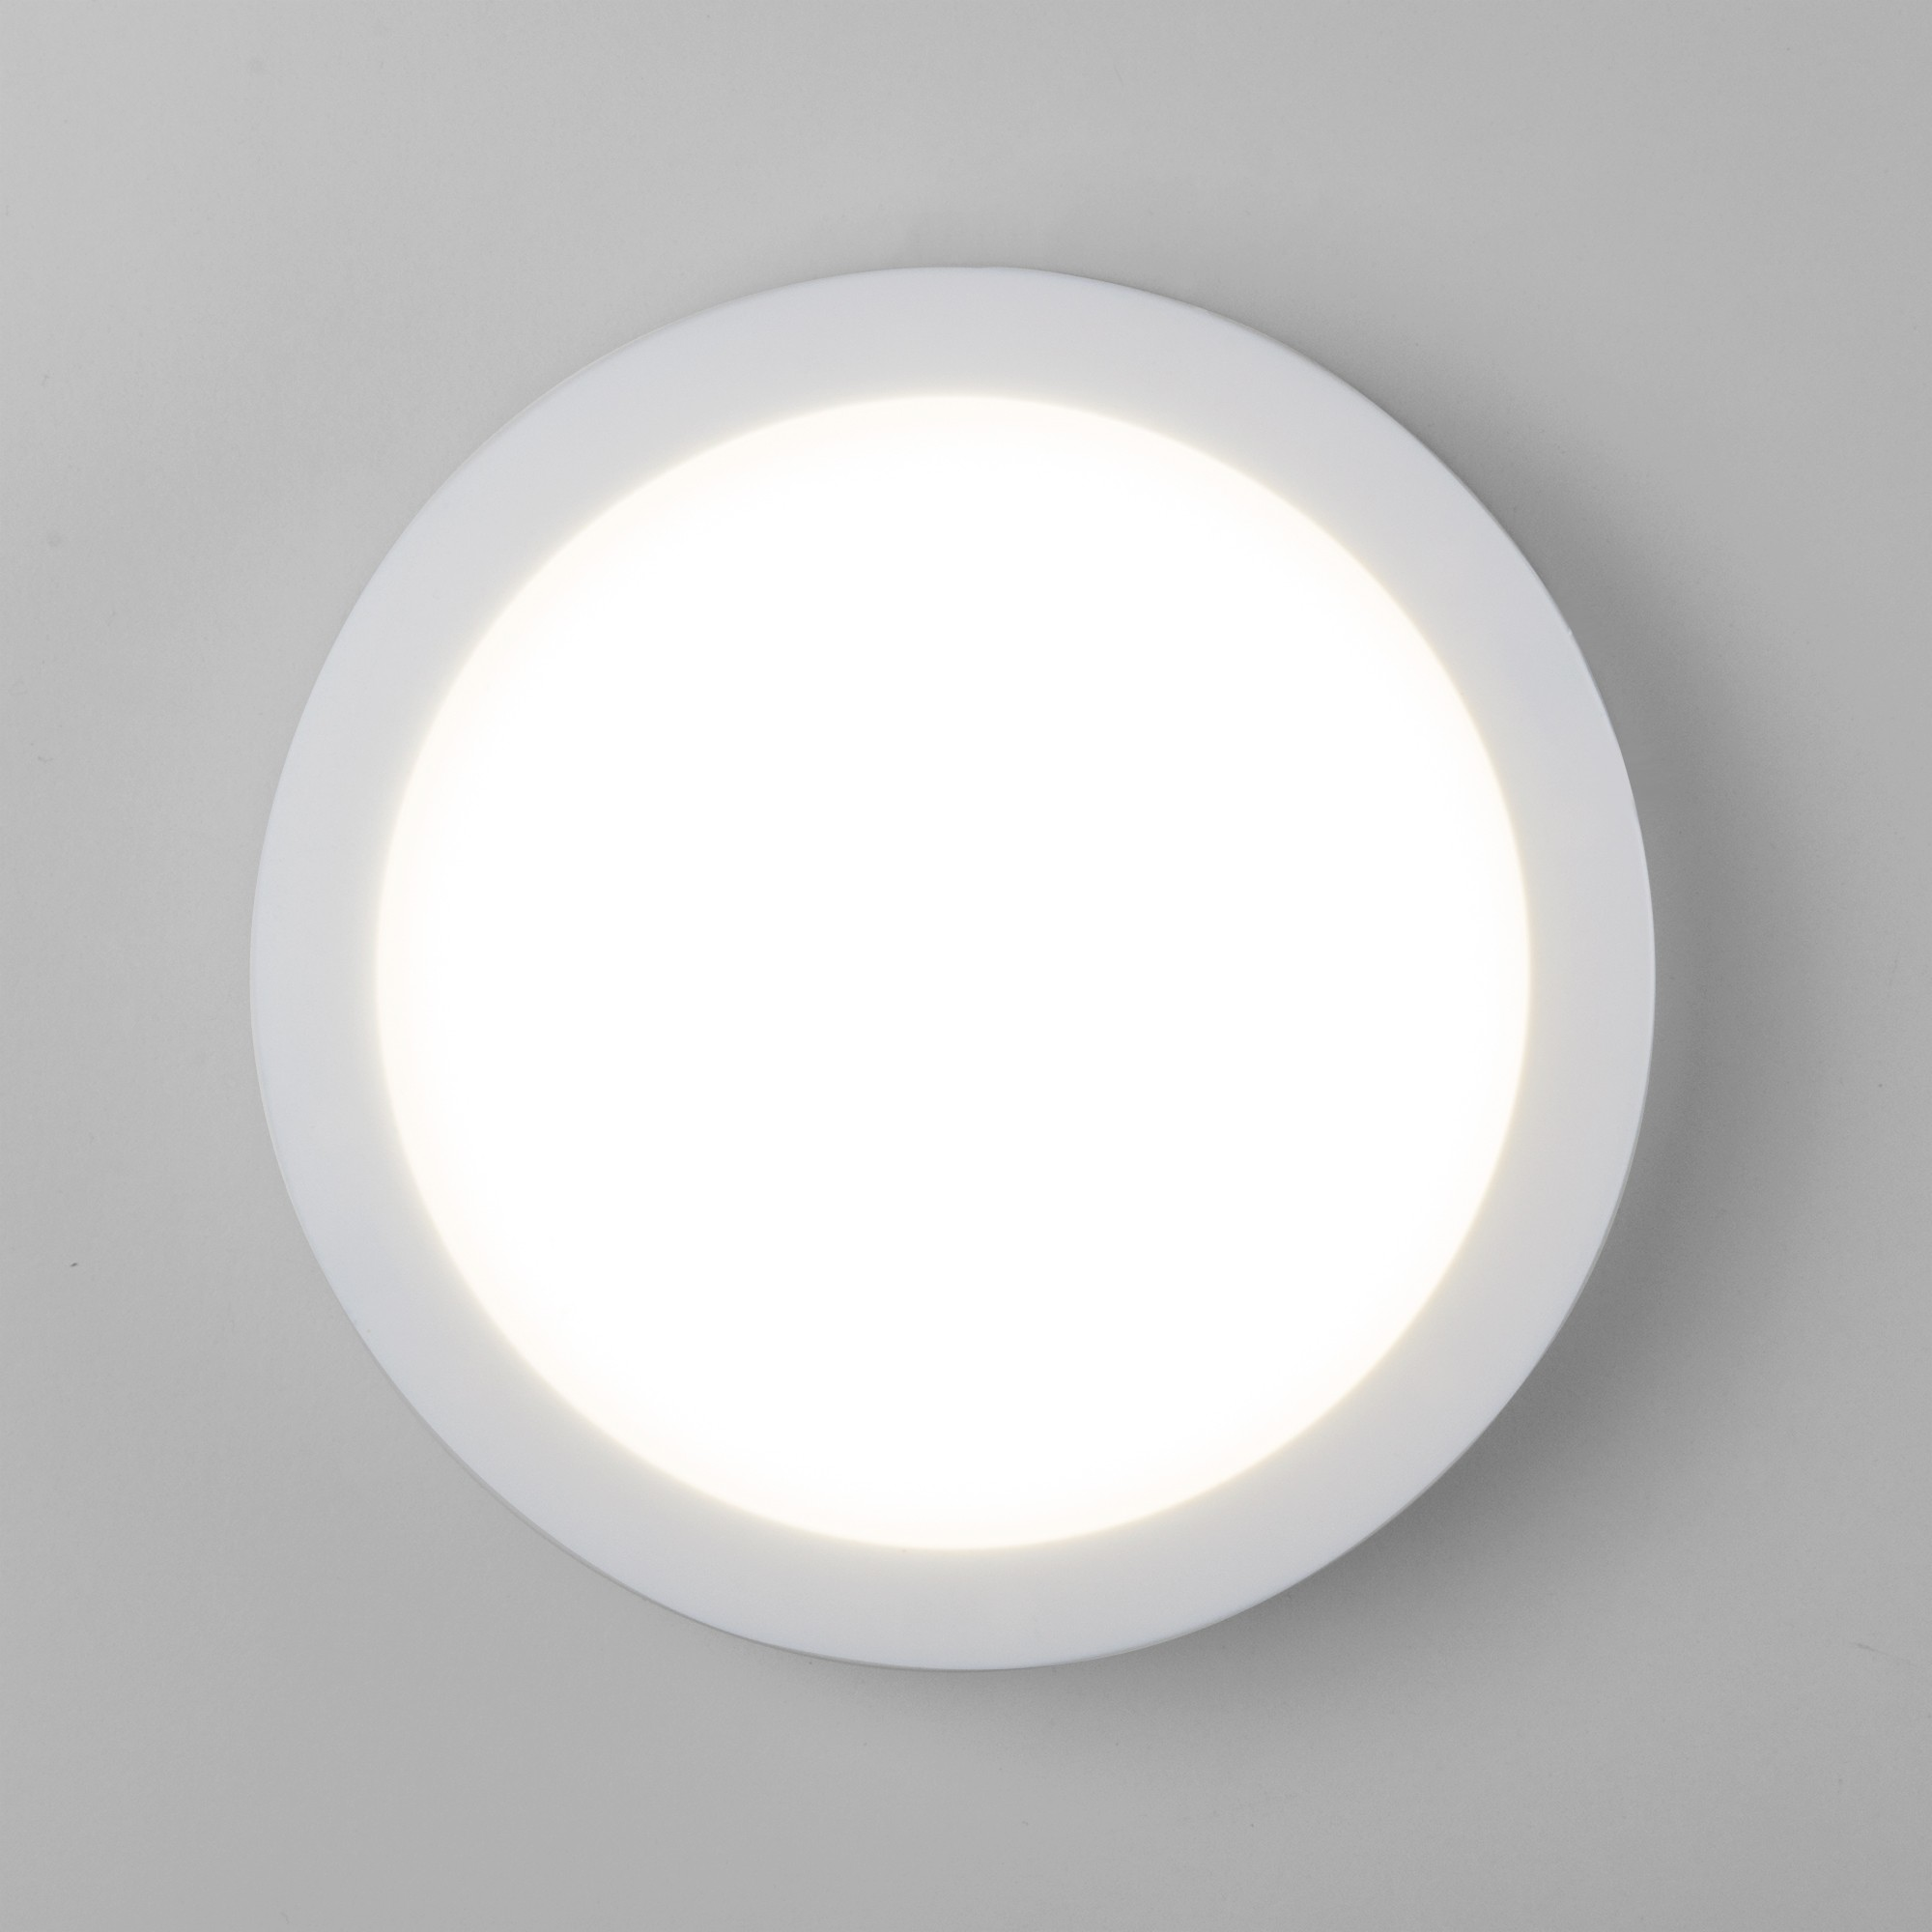 LTB51 LED Светильник 15W 4200K Белый